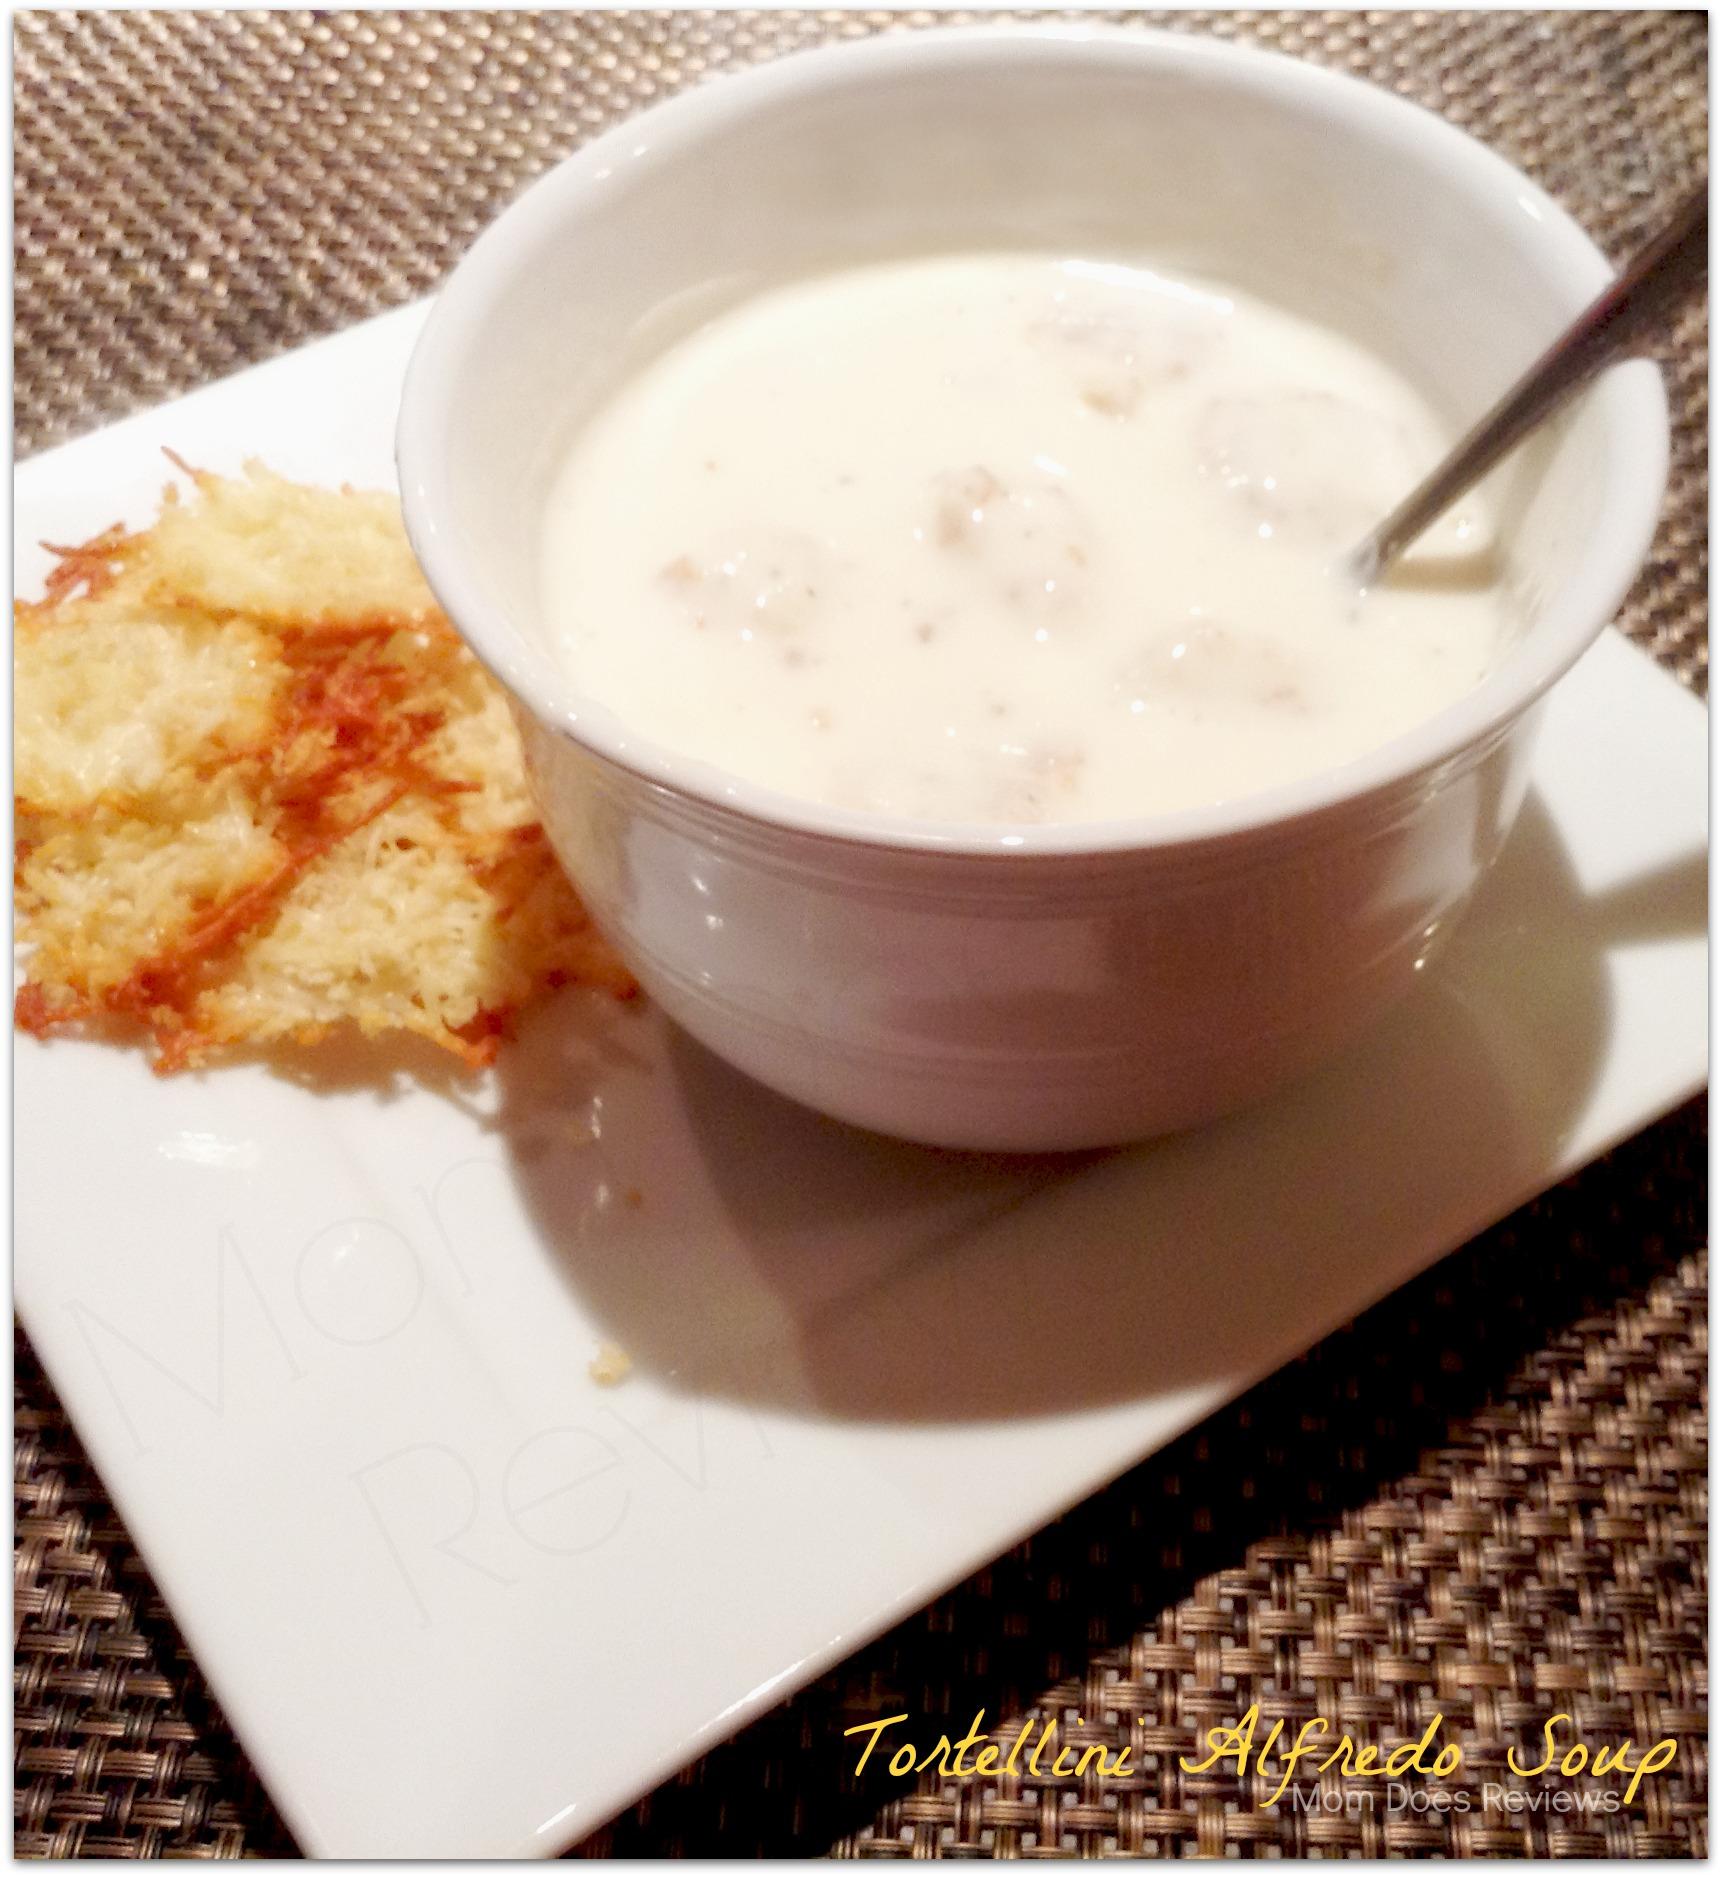 Tortellini Alfredo Soup Recipe at #MomDoesReviews